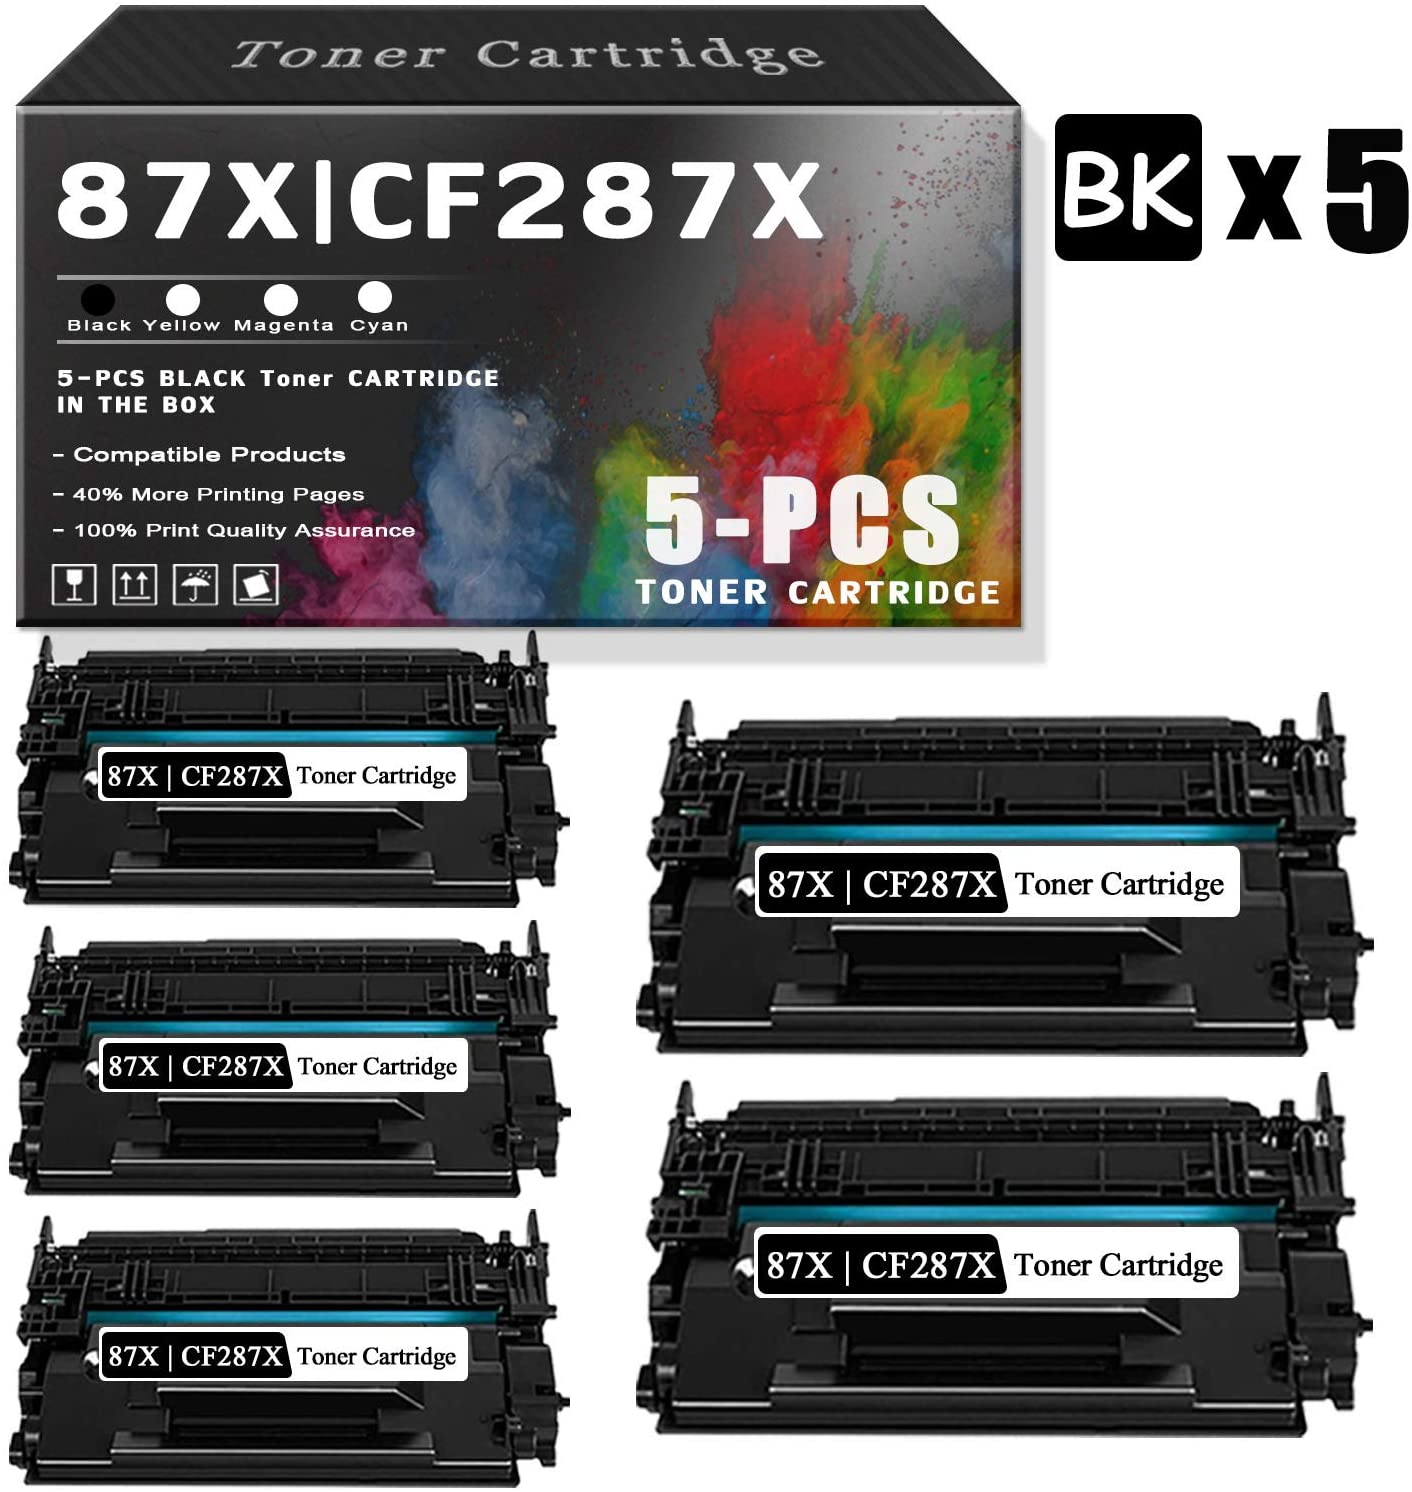 5-Pack 87X   CF287X Black TonerCartridgeCompatible for HP InkCartridgeReplacementforHP Laserjet Managed M506xm M506dnm Enterprise M506n M506dn MFP M527dn M527f Flow MFP M527z M527cPrinters.